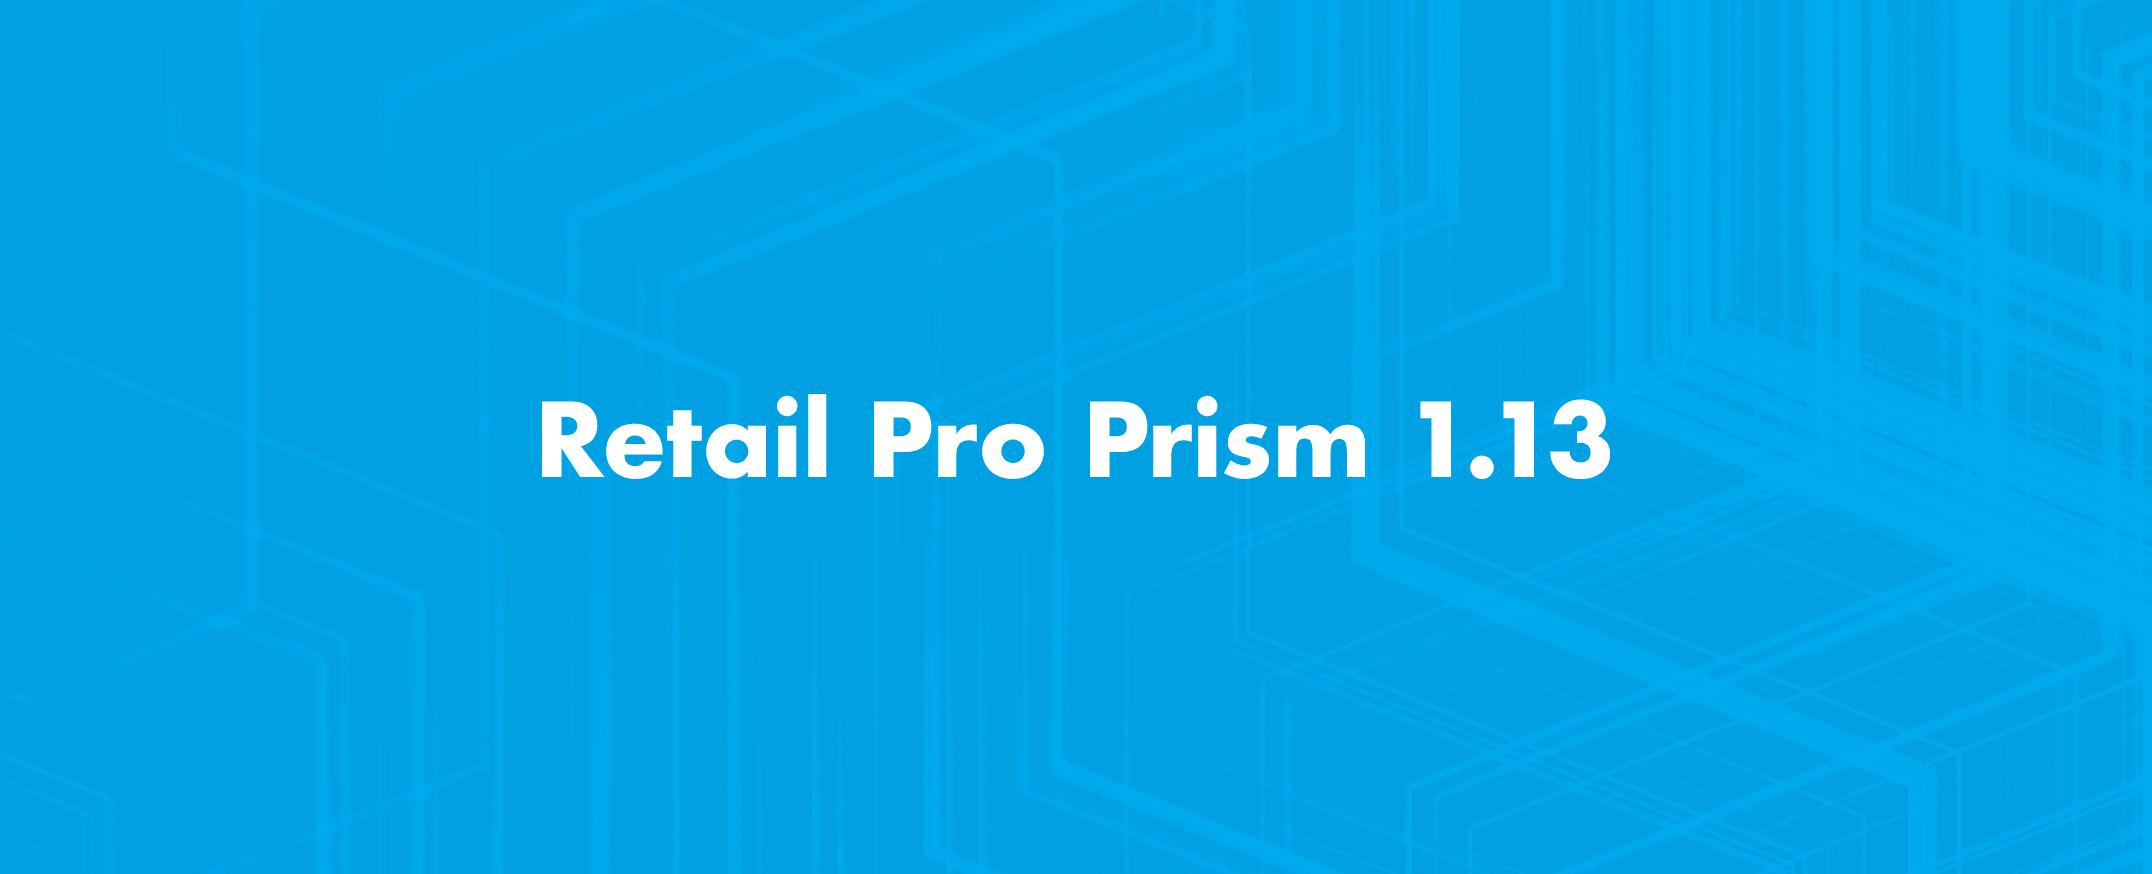 Retail-Pro-Prism-Releases-Retail-Pro-1.13